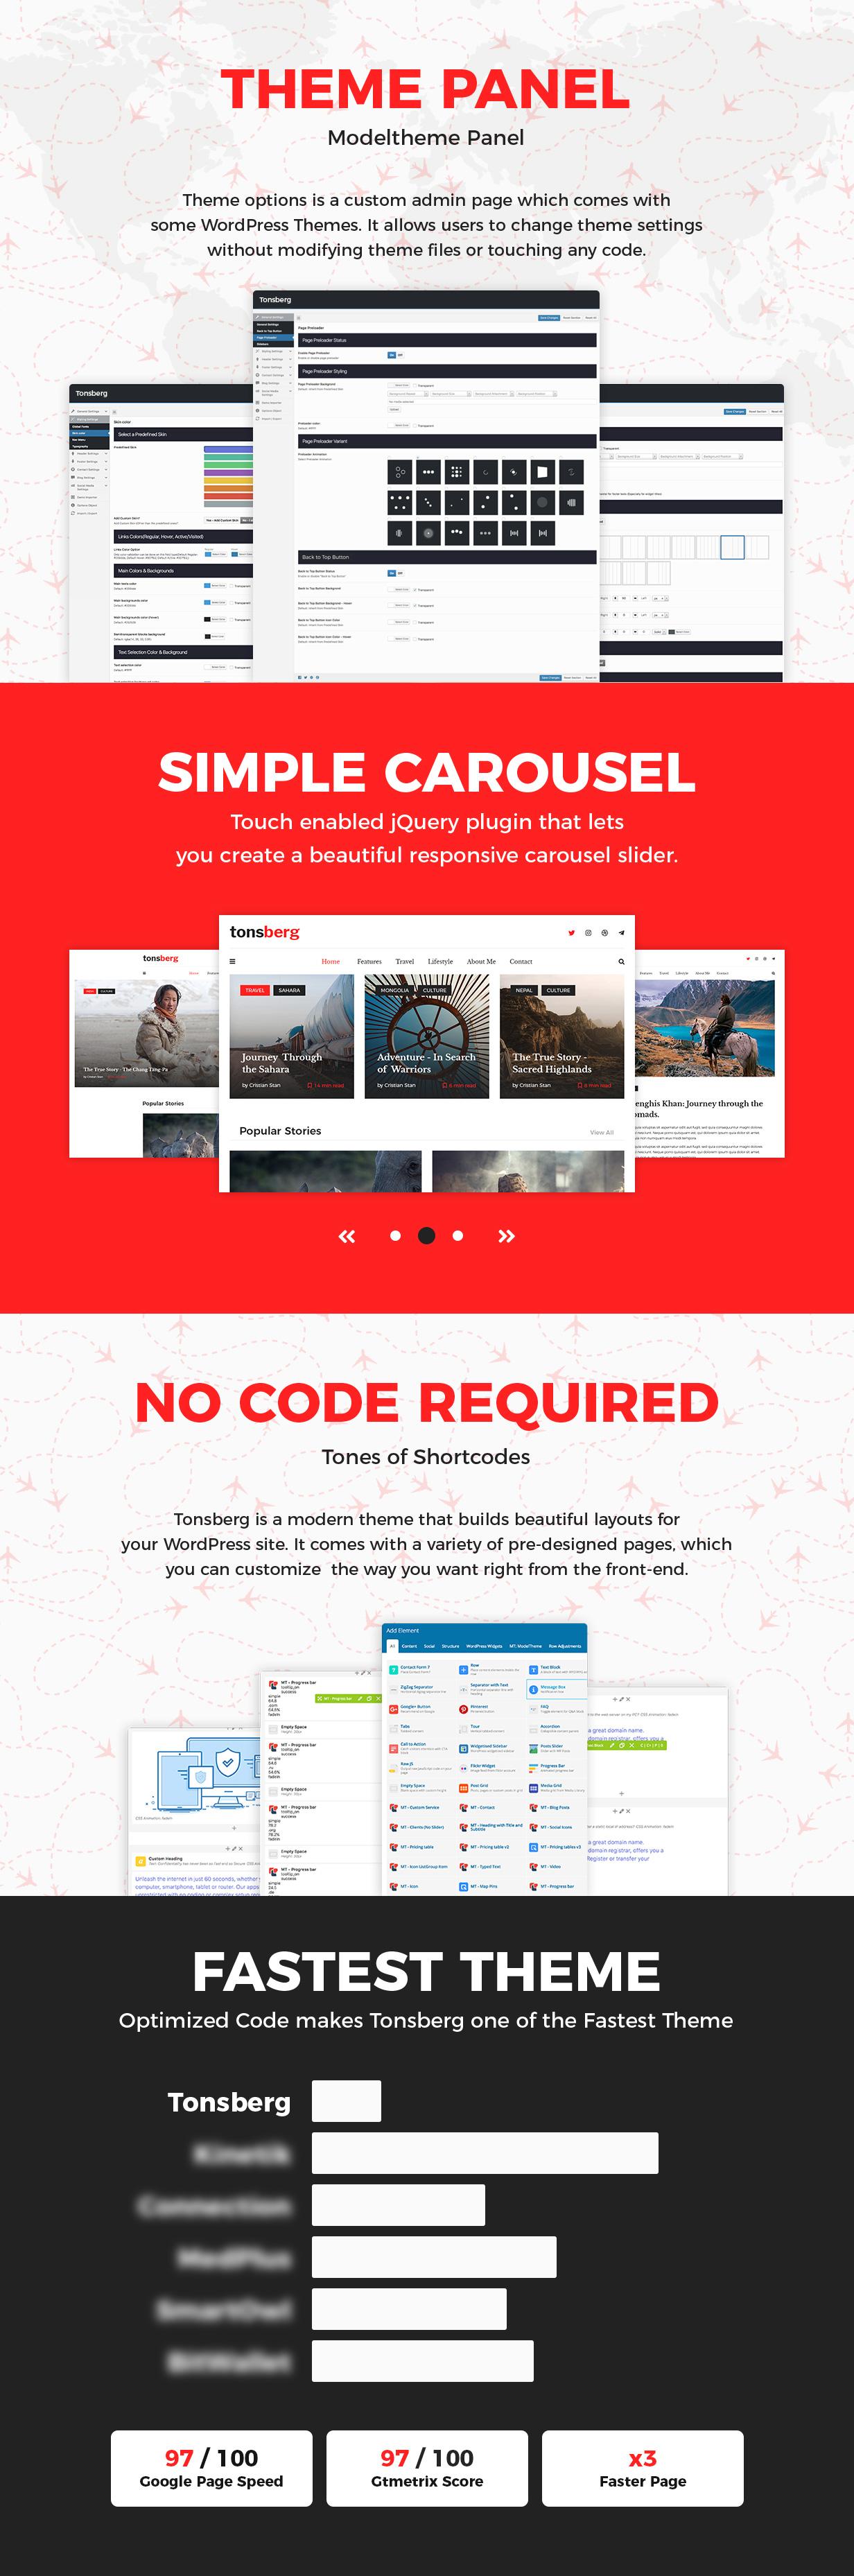 Tonsberg - A Modern WordPress Theme for Travel Bloggers - 4